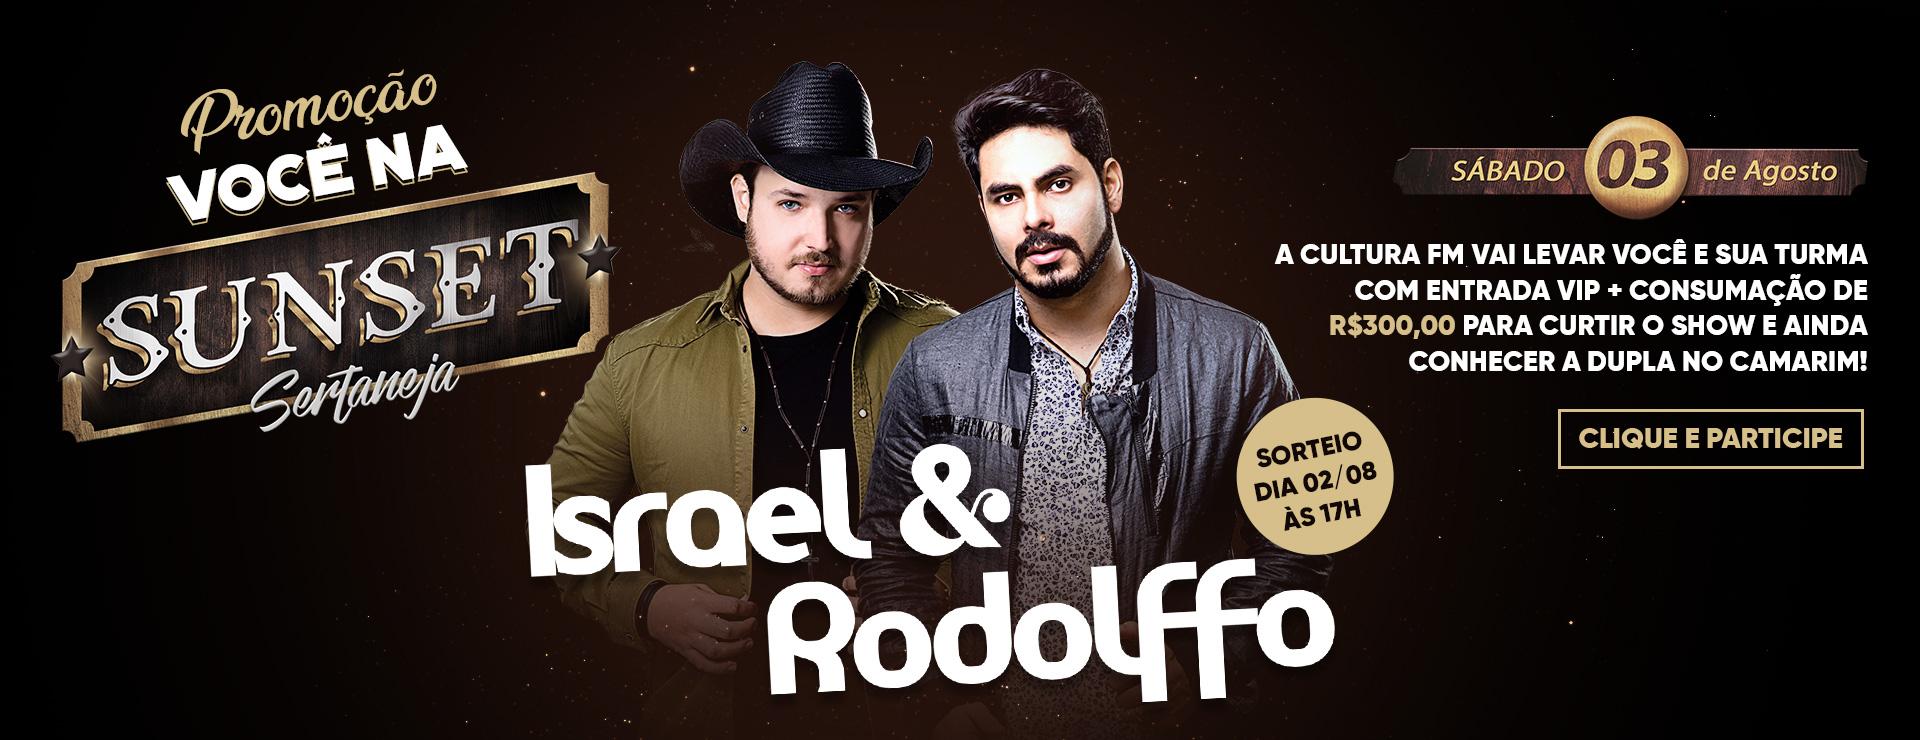 Sunset sertaneja com Israel e Rodolffo